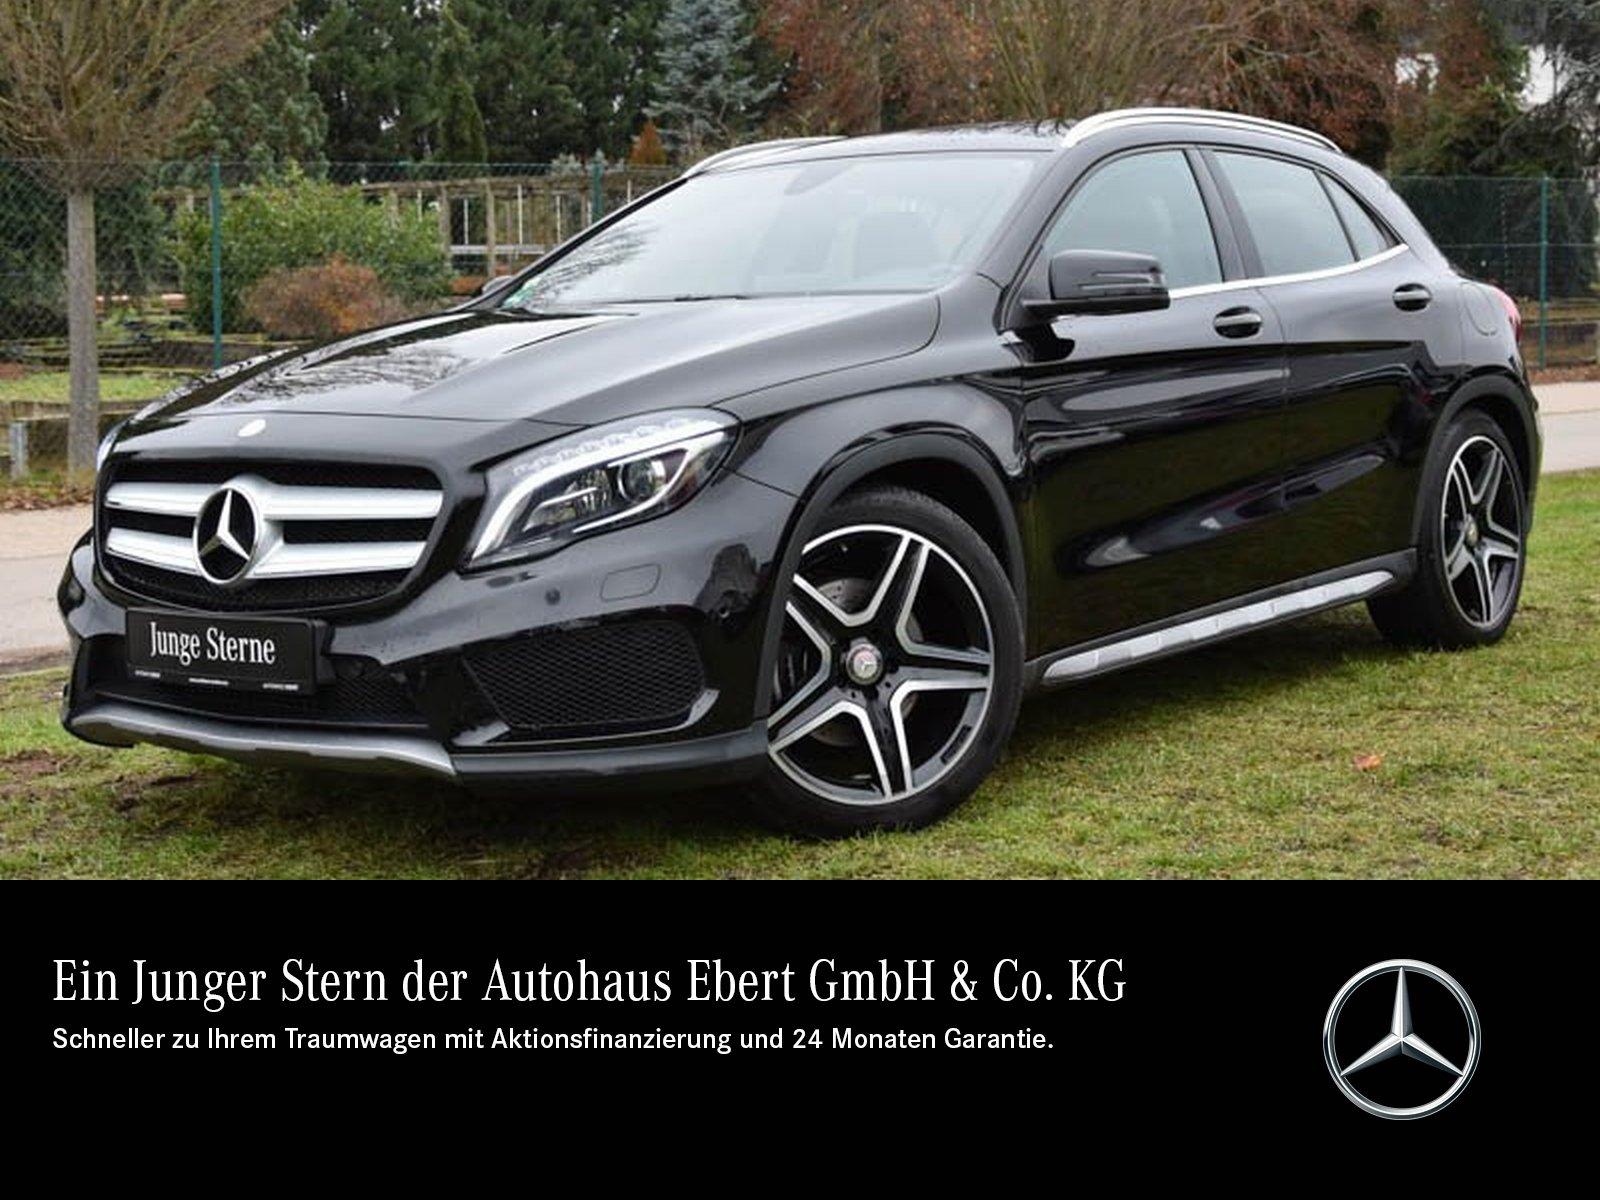 Mercedes-Benz GLA 250 AMG Line NAVI+ILS+RFK+EASY-PACK+SITZHZG, Jahr 2016, Benzin